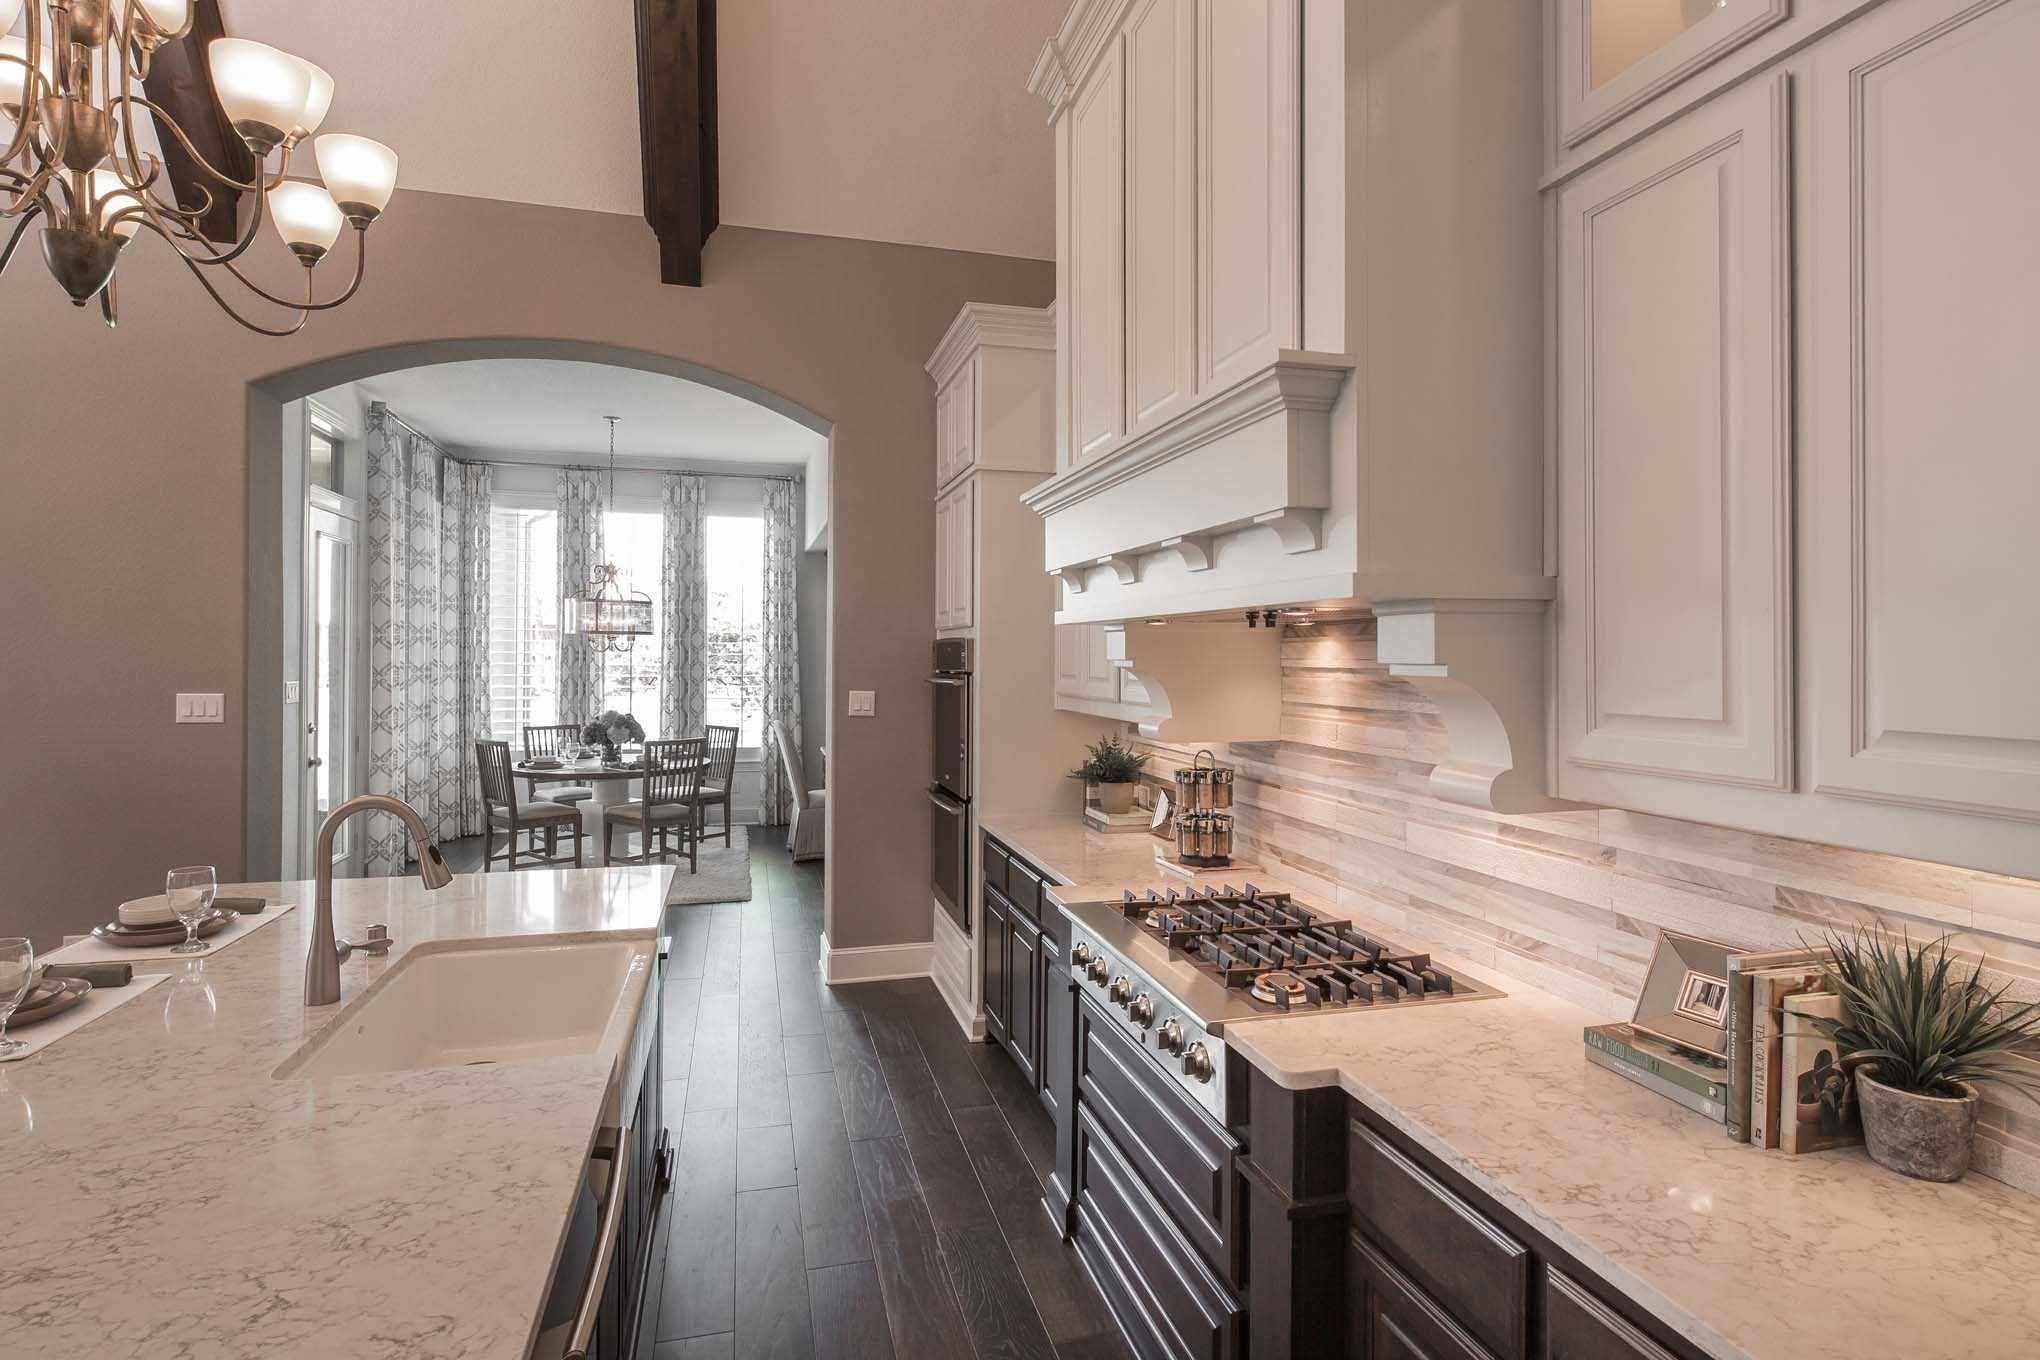 Kitchen in Highland Homes 292 Plan at 6249 Edgestone Drive